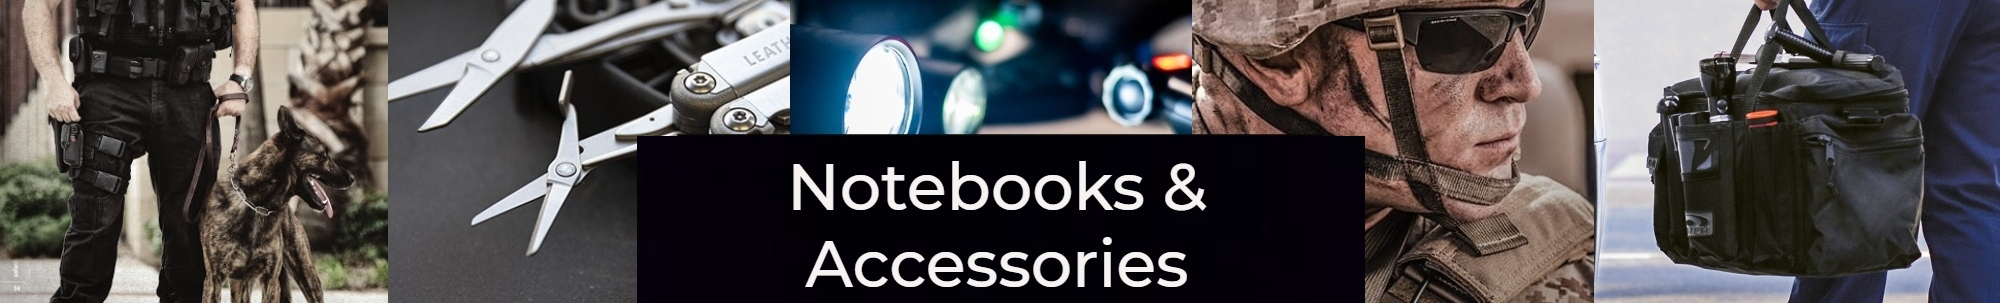 Equipment-notebooks.jpg